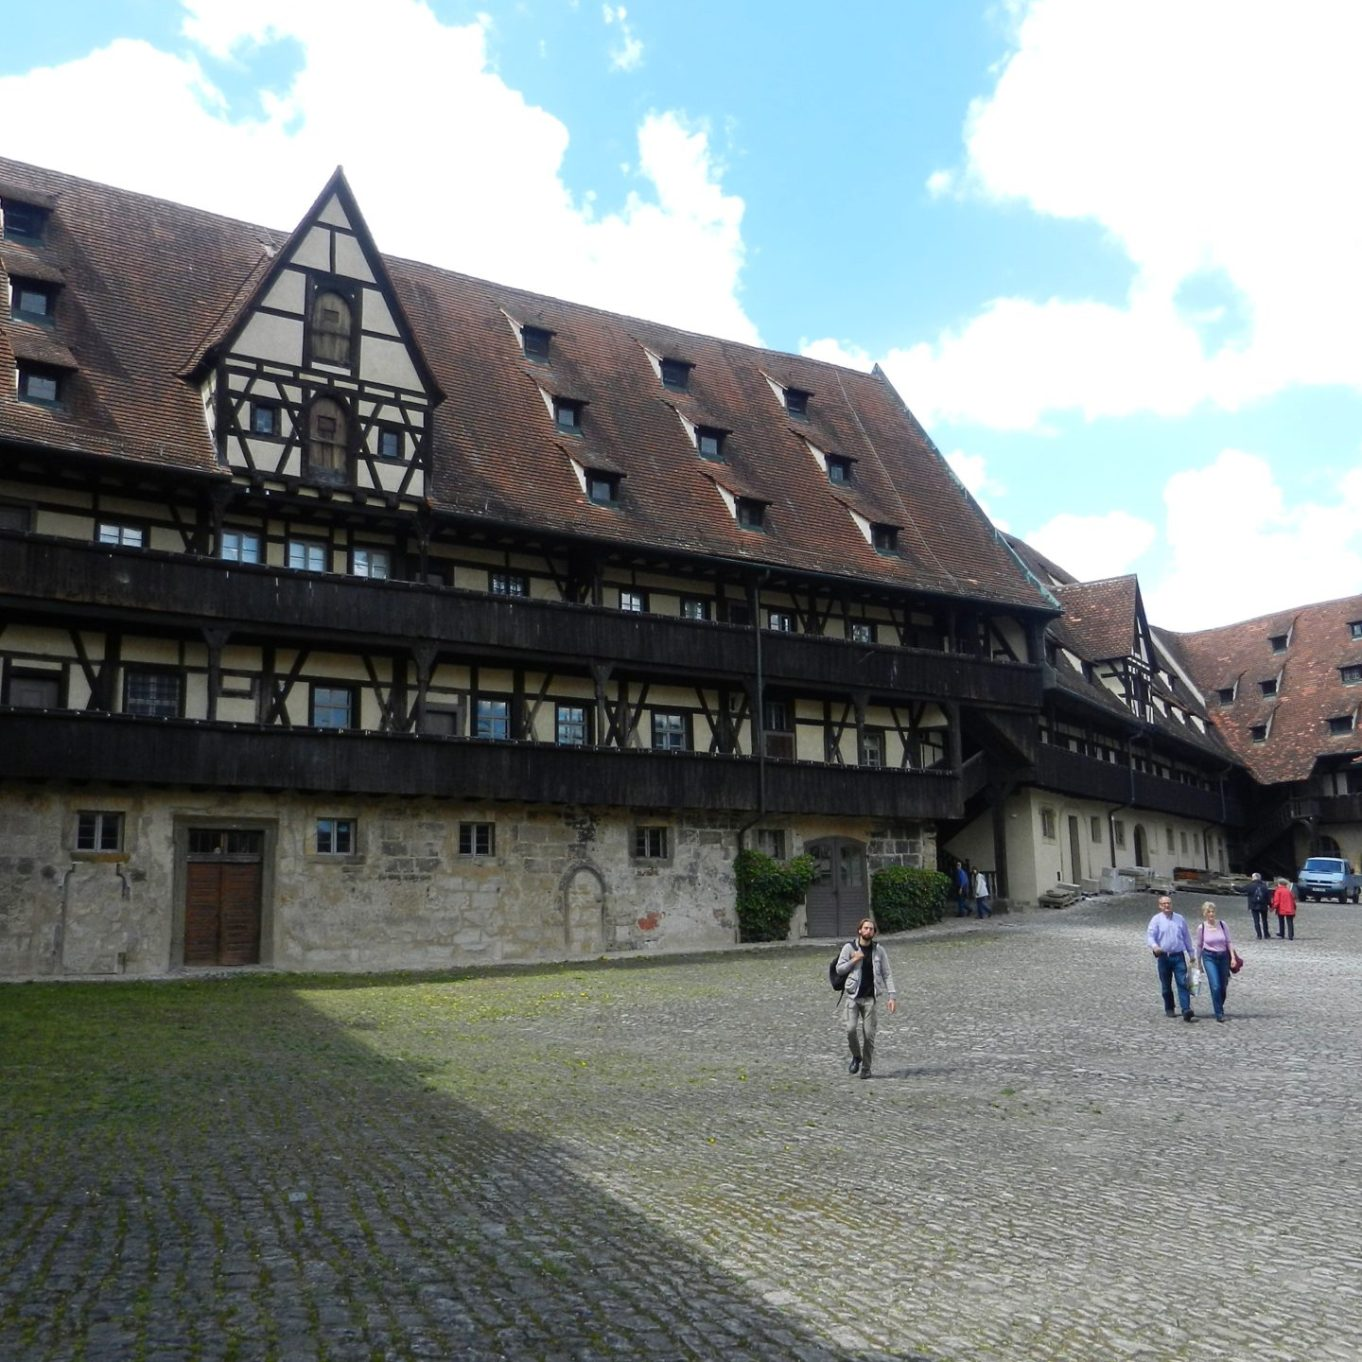 Hofhaltung, Bamberg, Germany